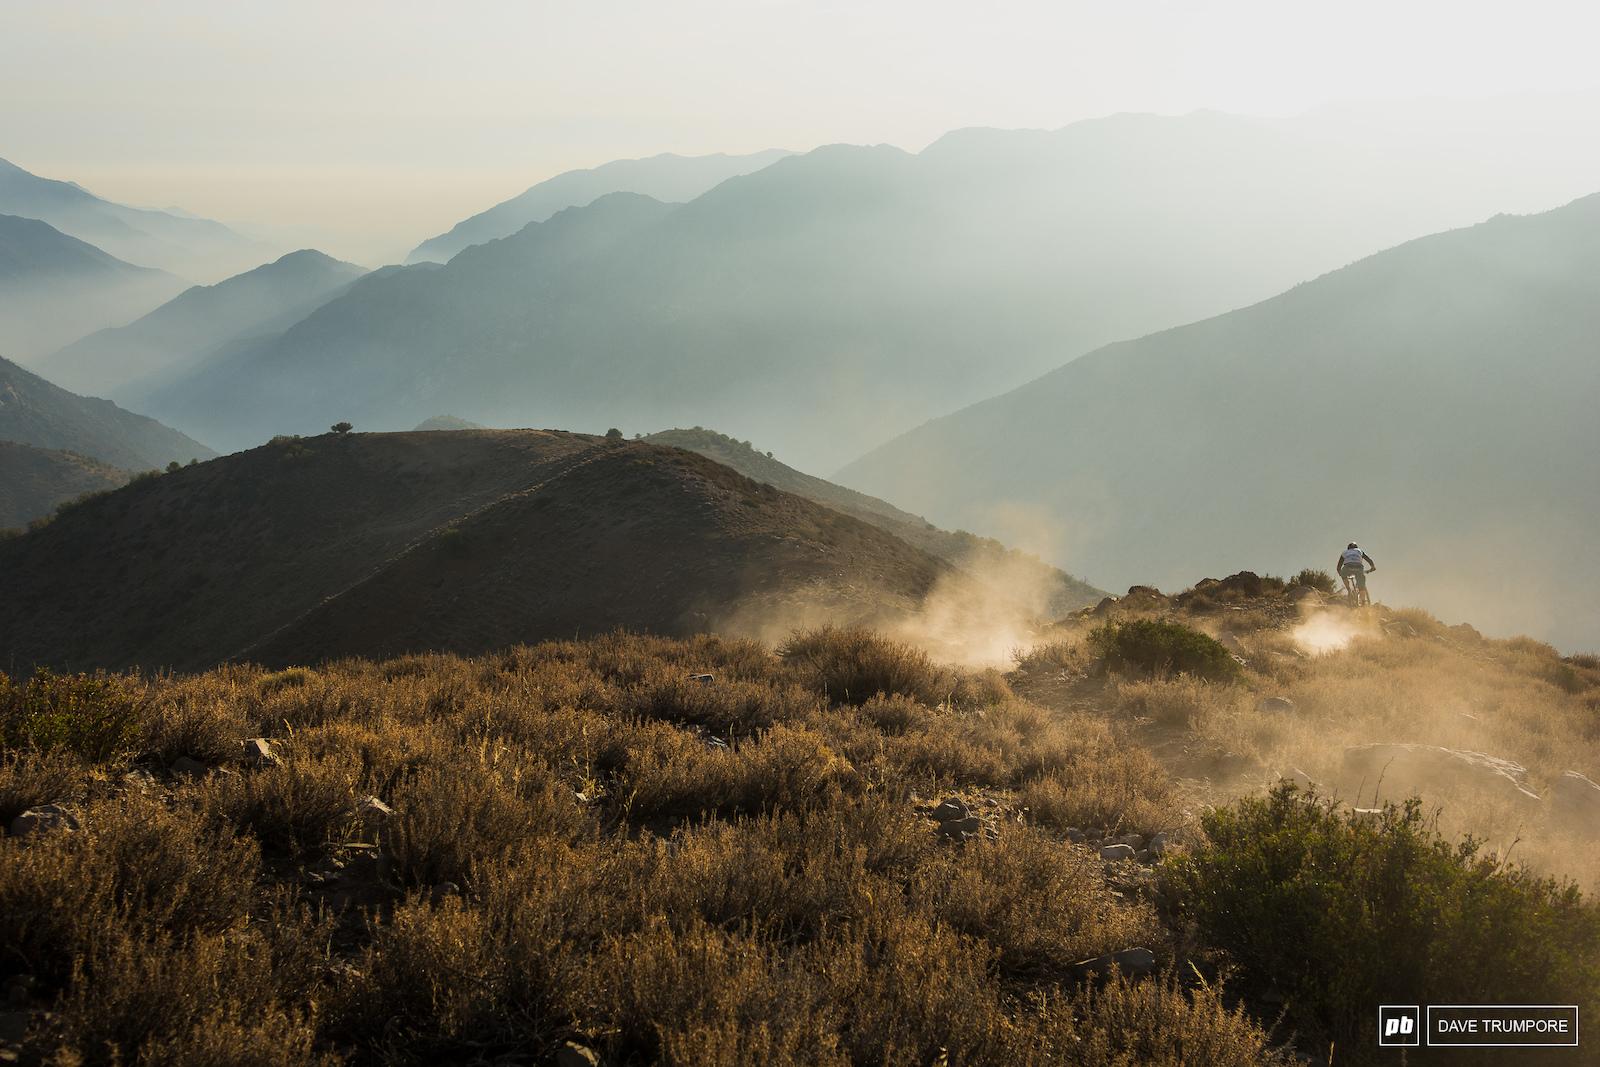 Jared Graves Parvazo Trail below La Parva Chile.